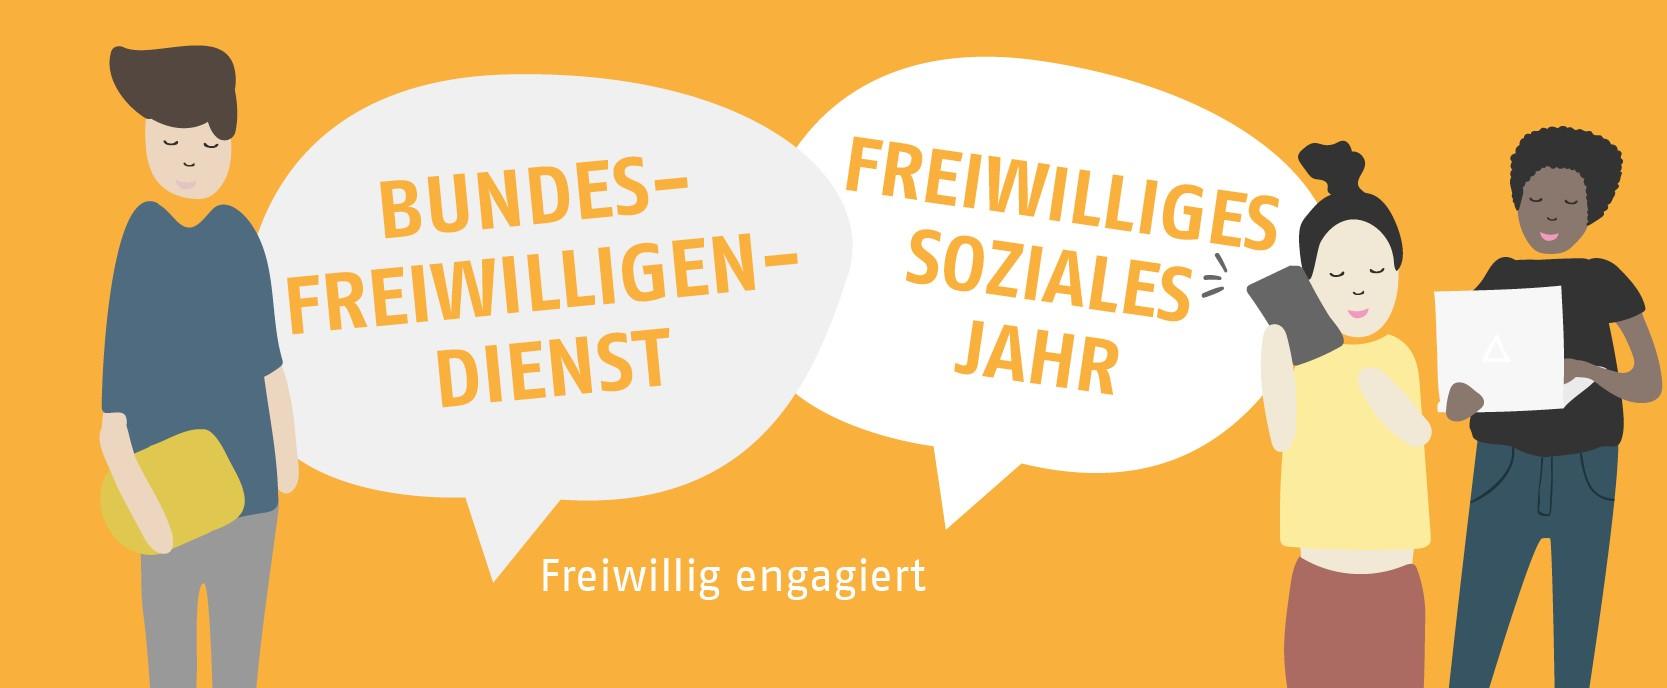 AWO Bezirksverband Ober- und Mittelfranken e. V. - Freiwillige (FSJ/BFD)